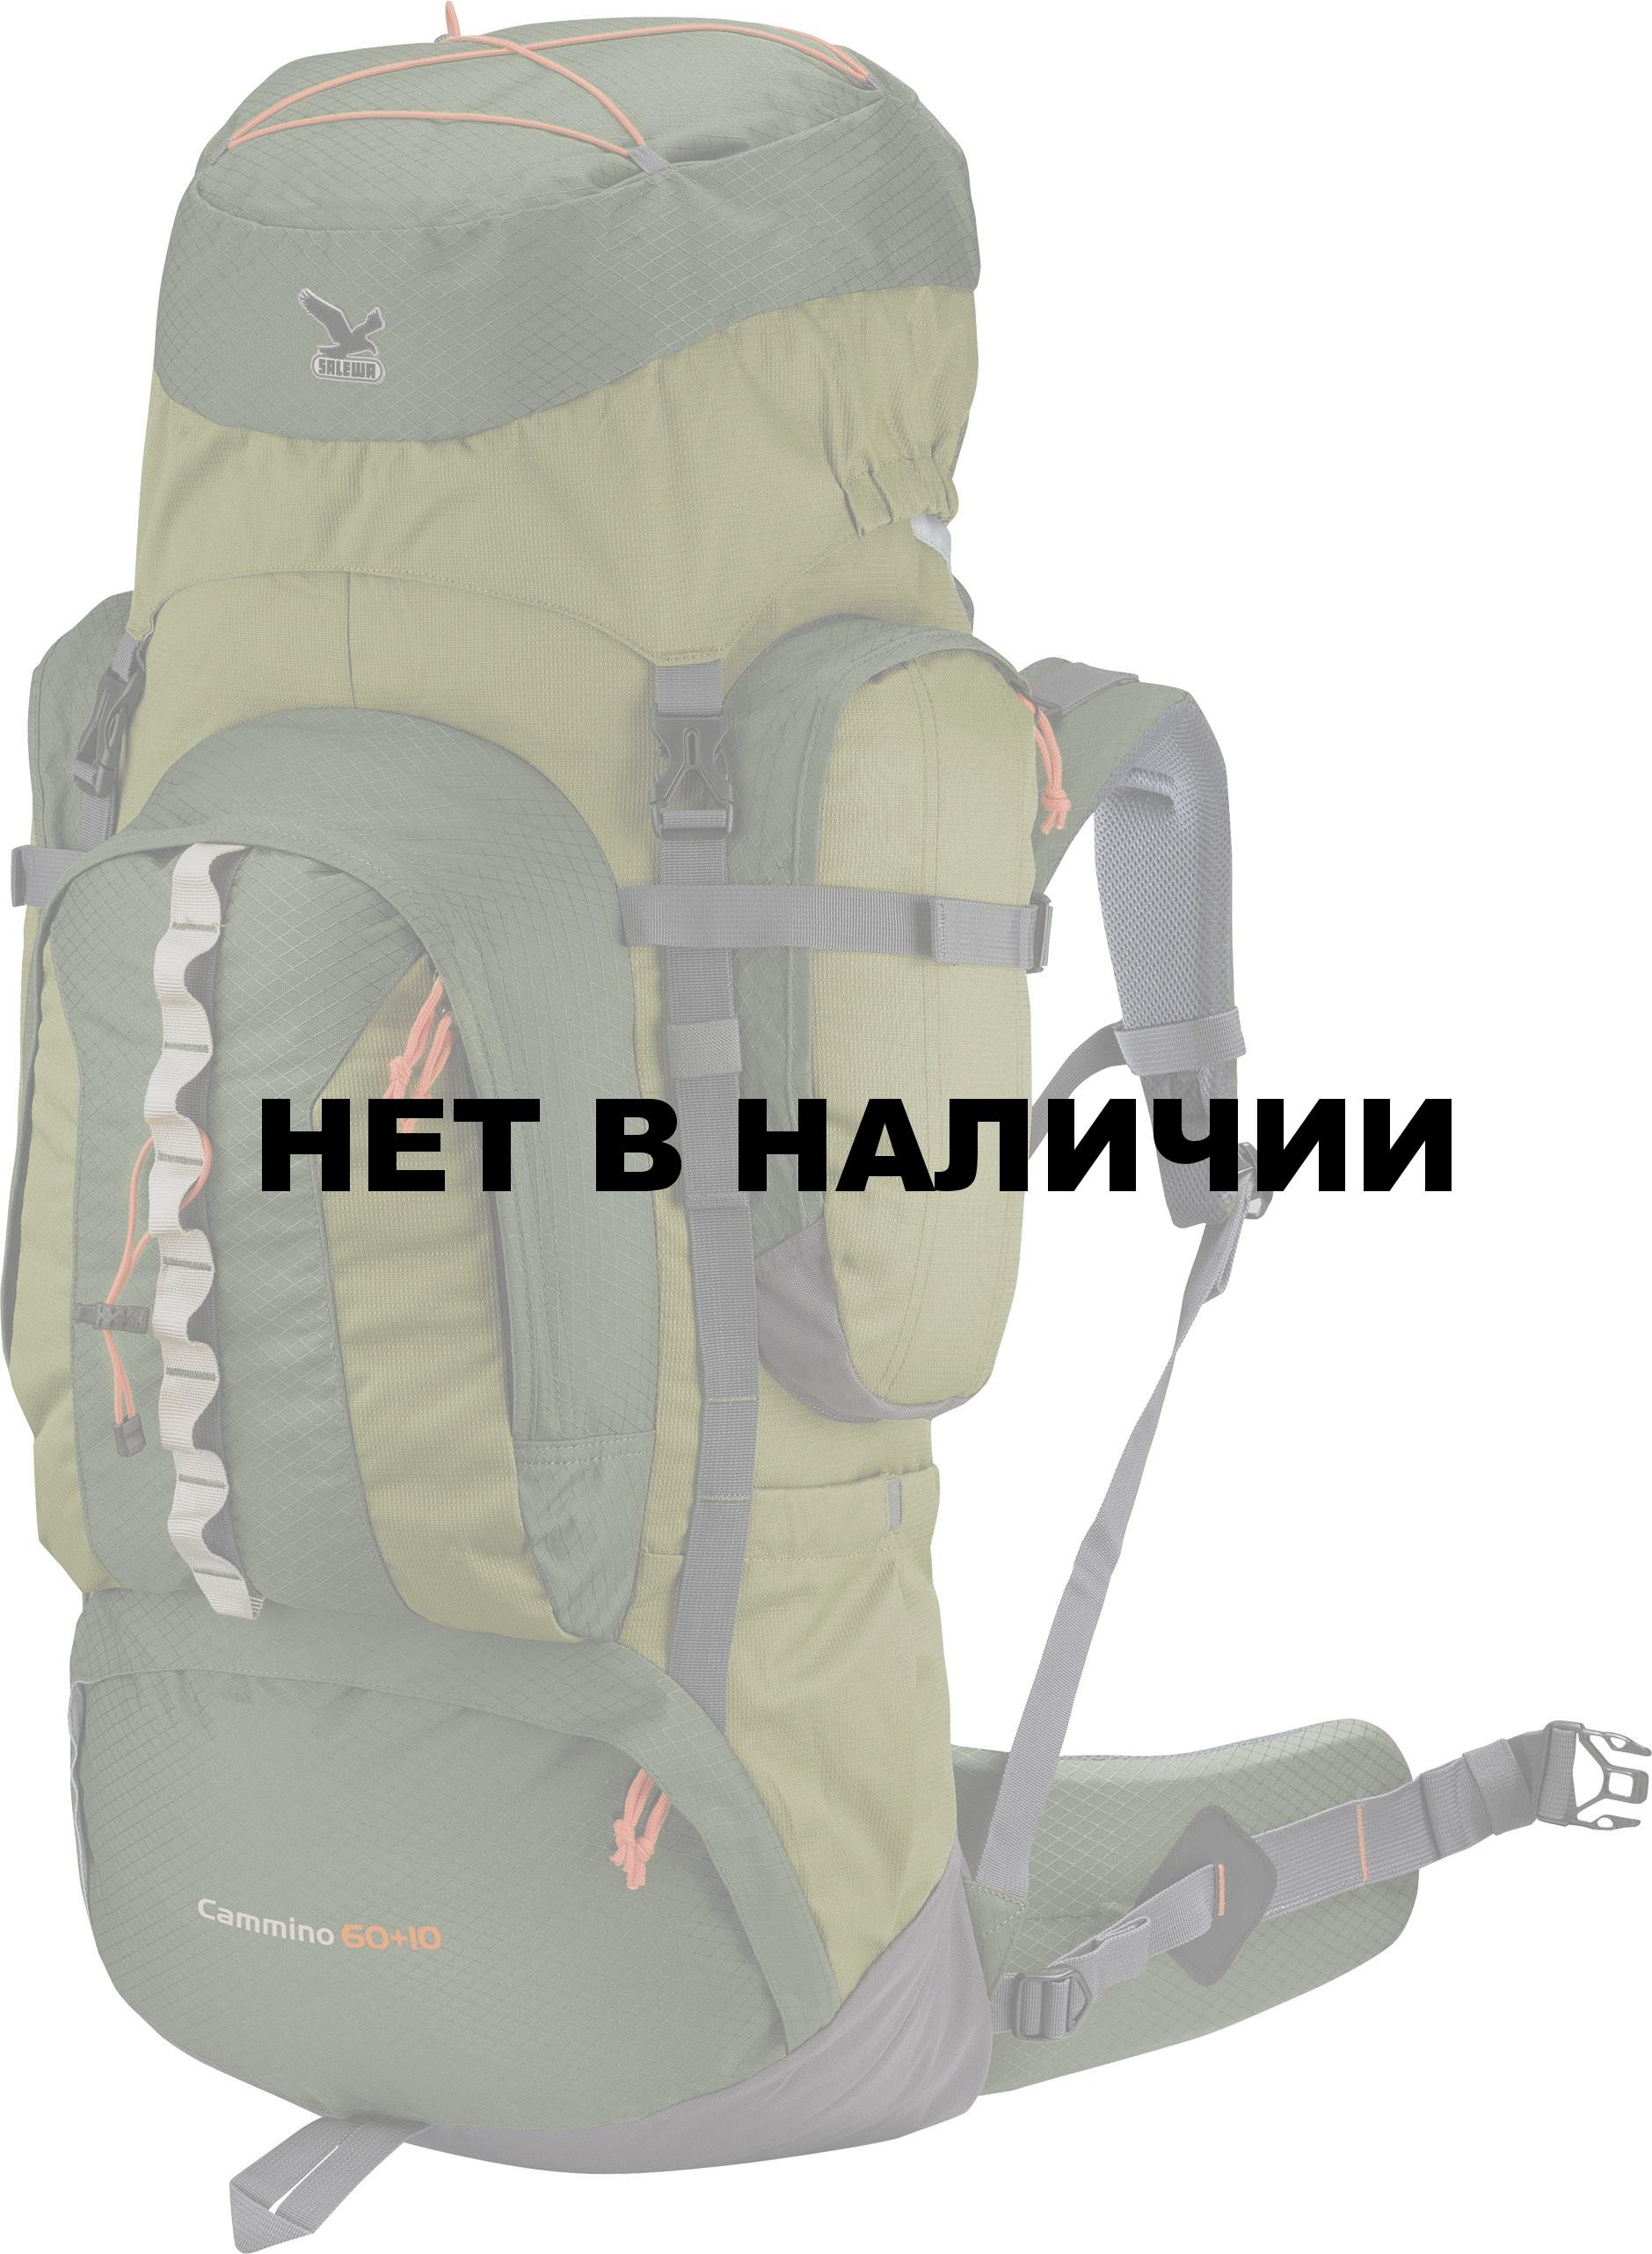 Салева рюкзаки купить белгород braun buffel чемоданы